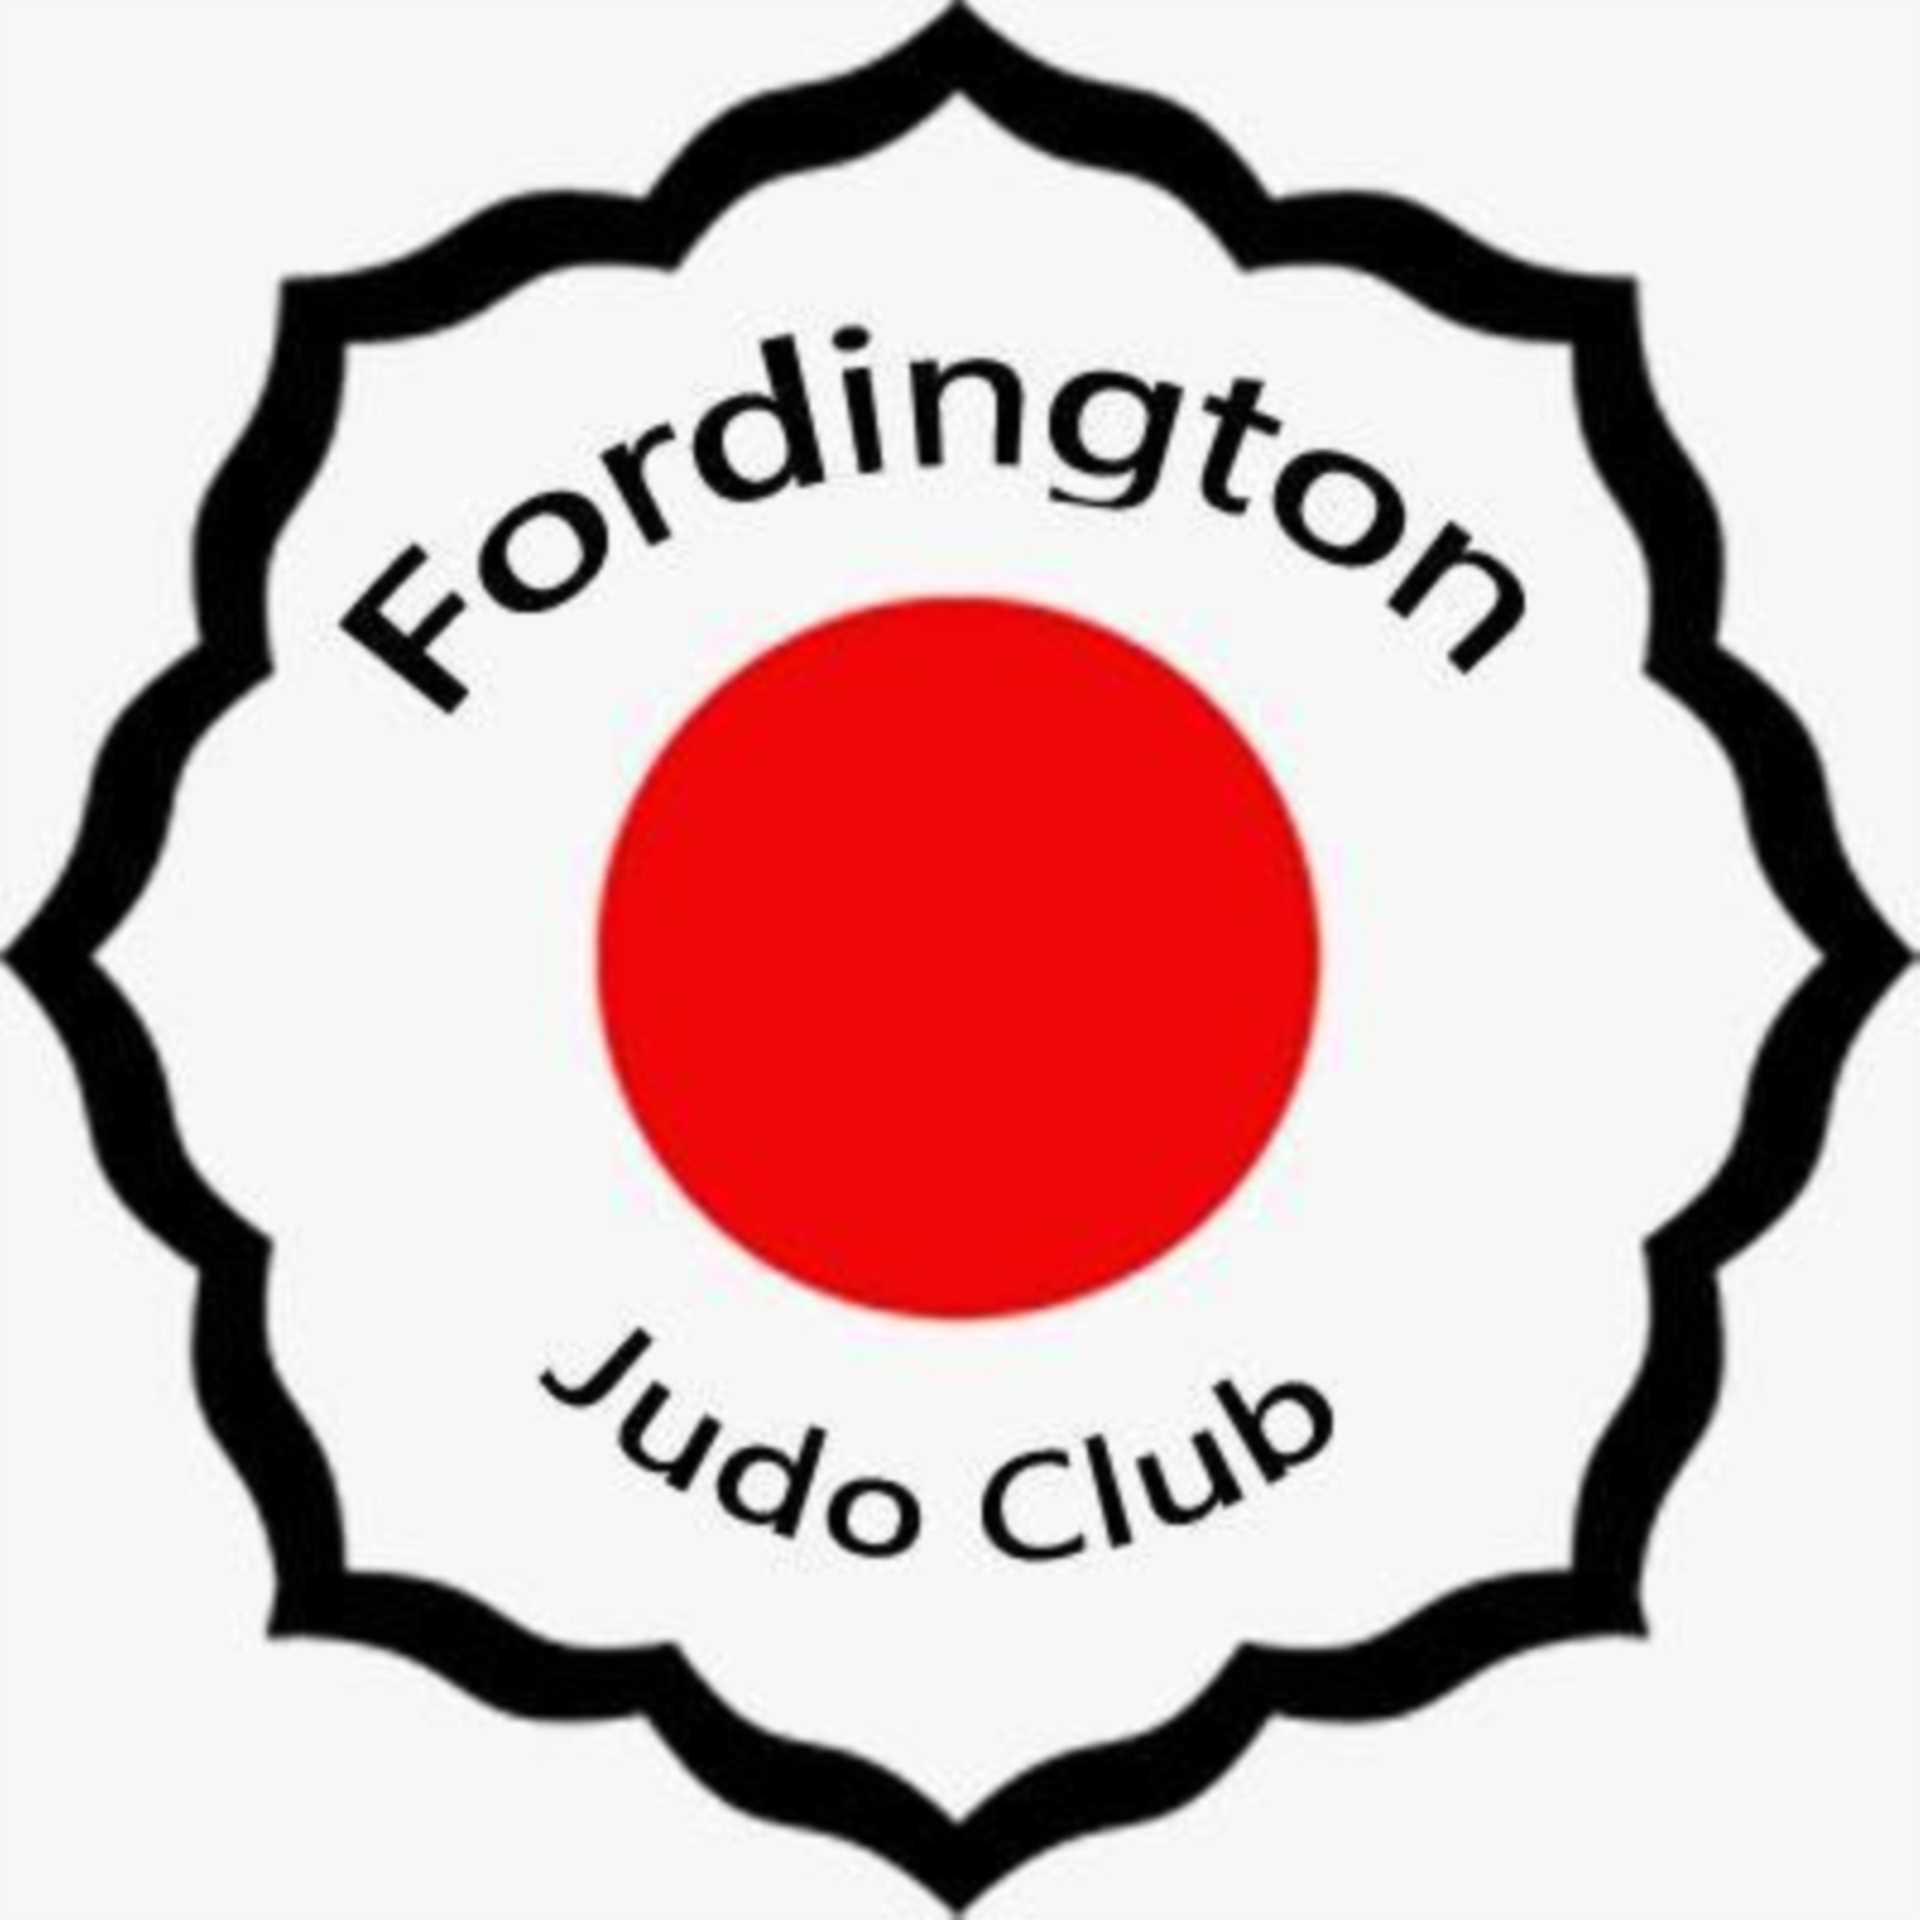 New Judo Club